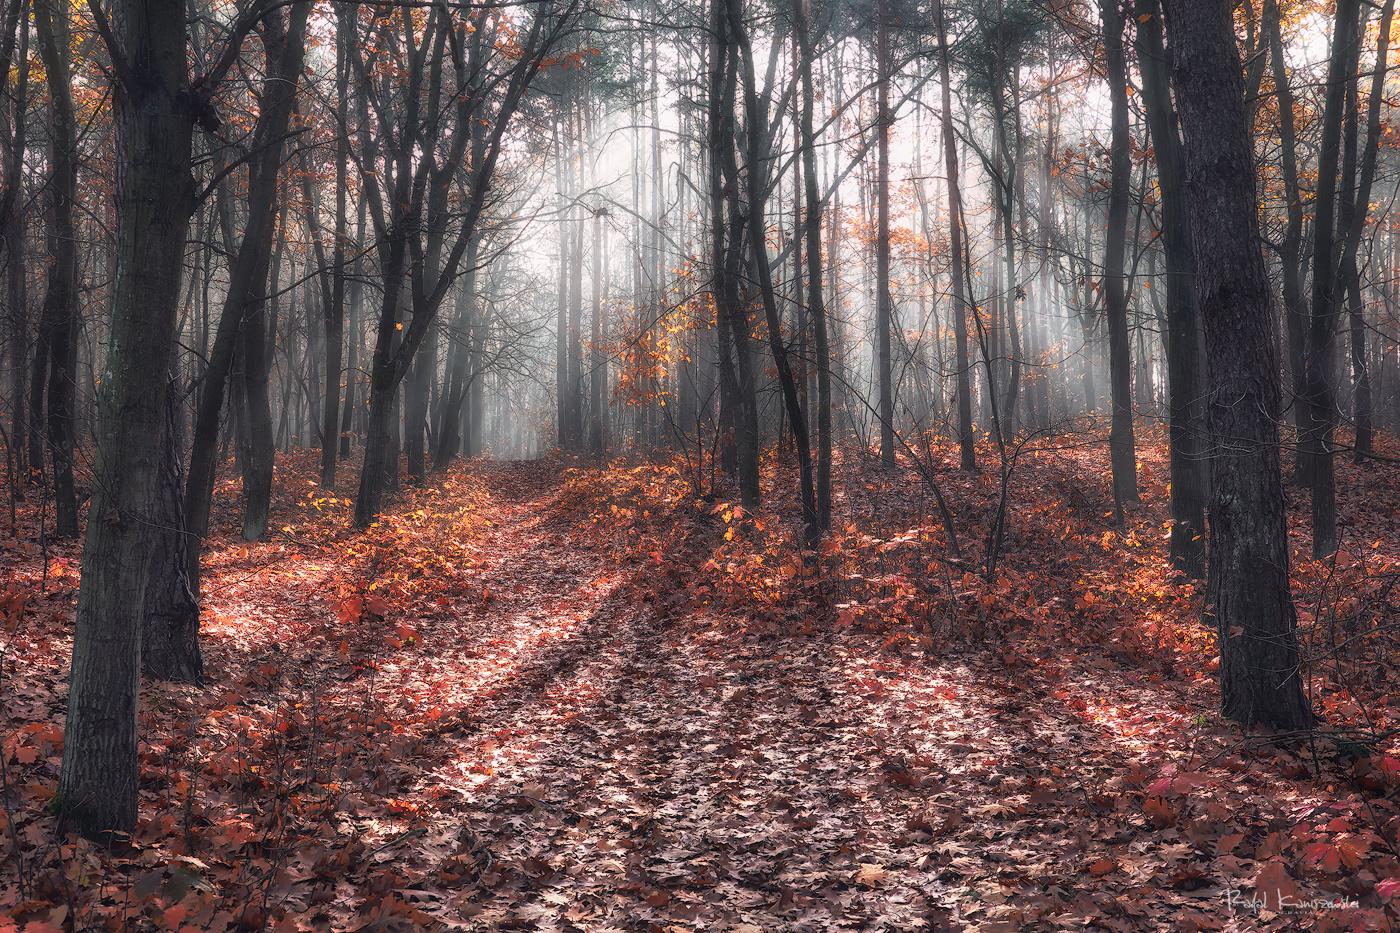 Magical morning by Rafal Kani